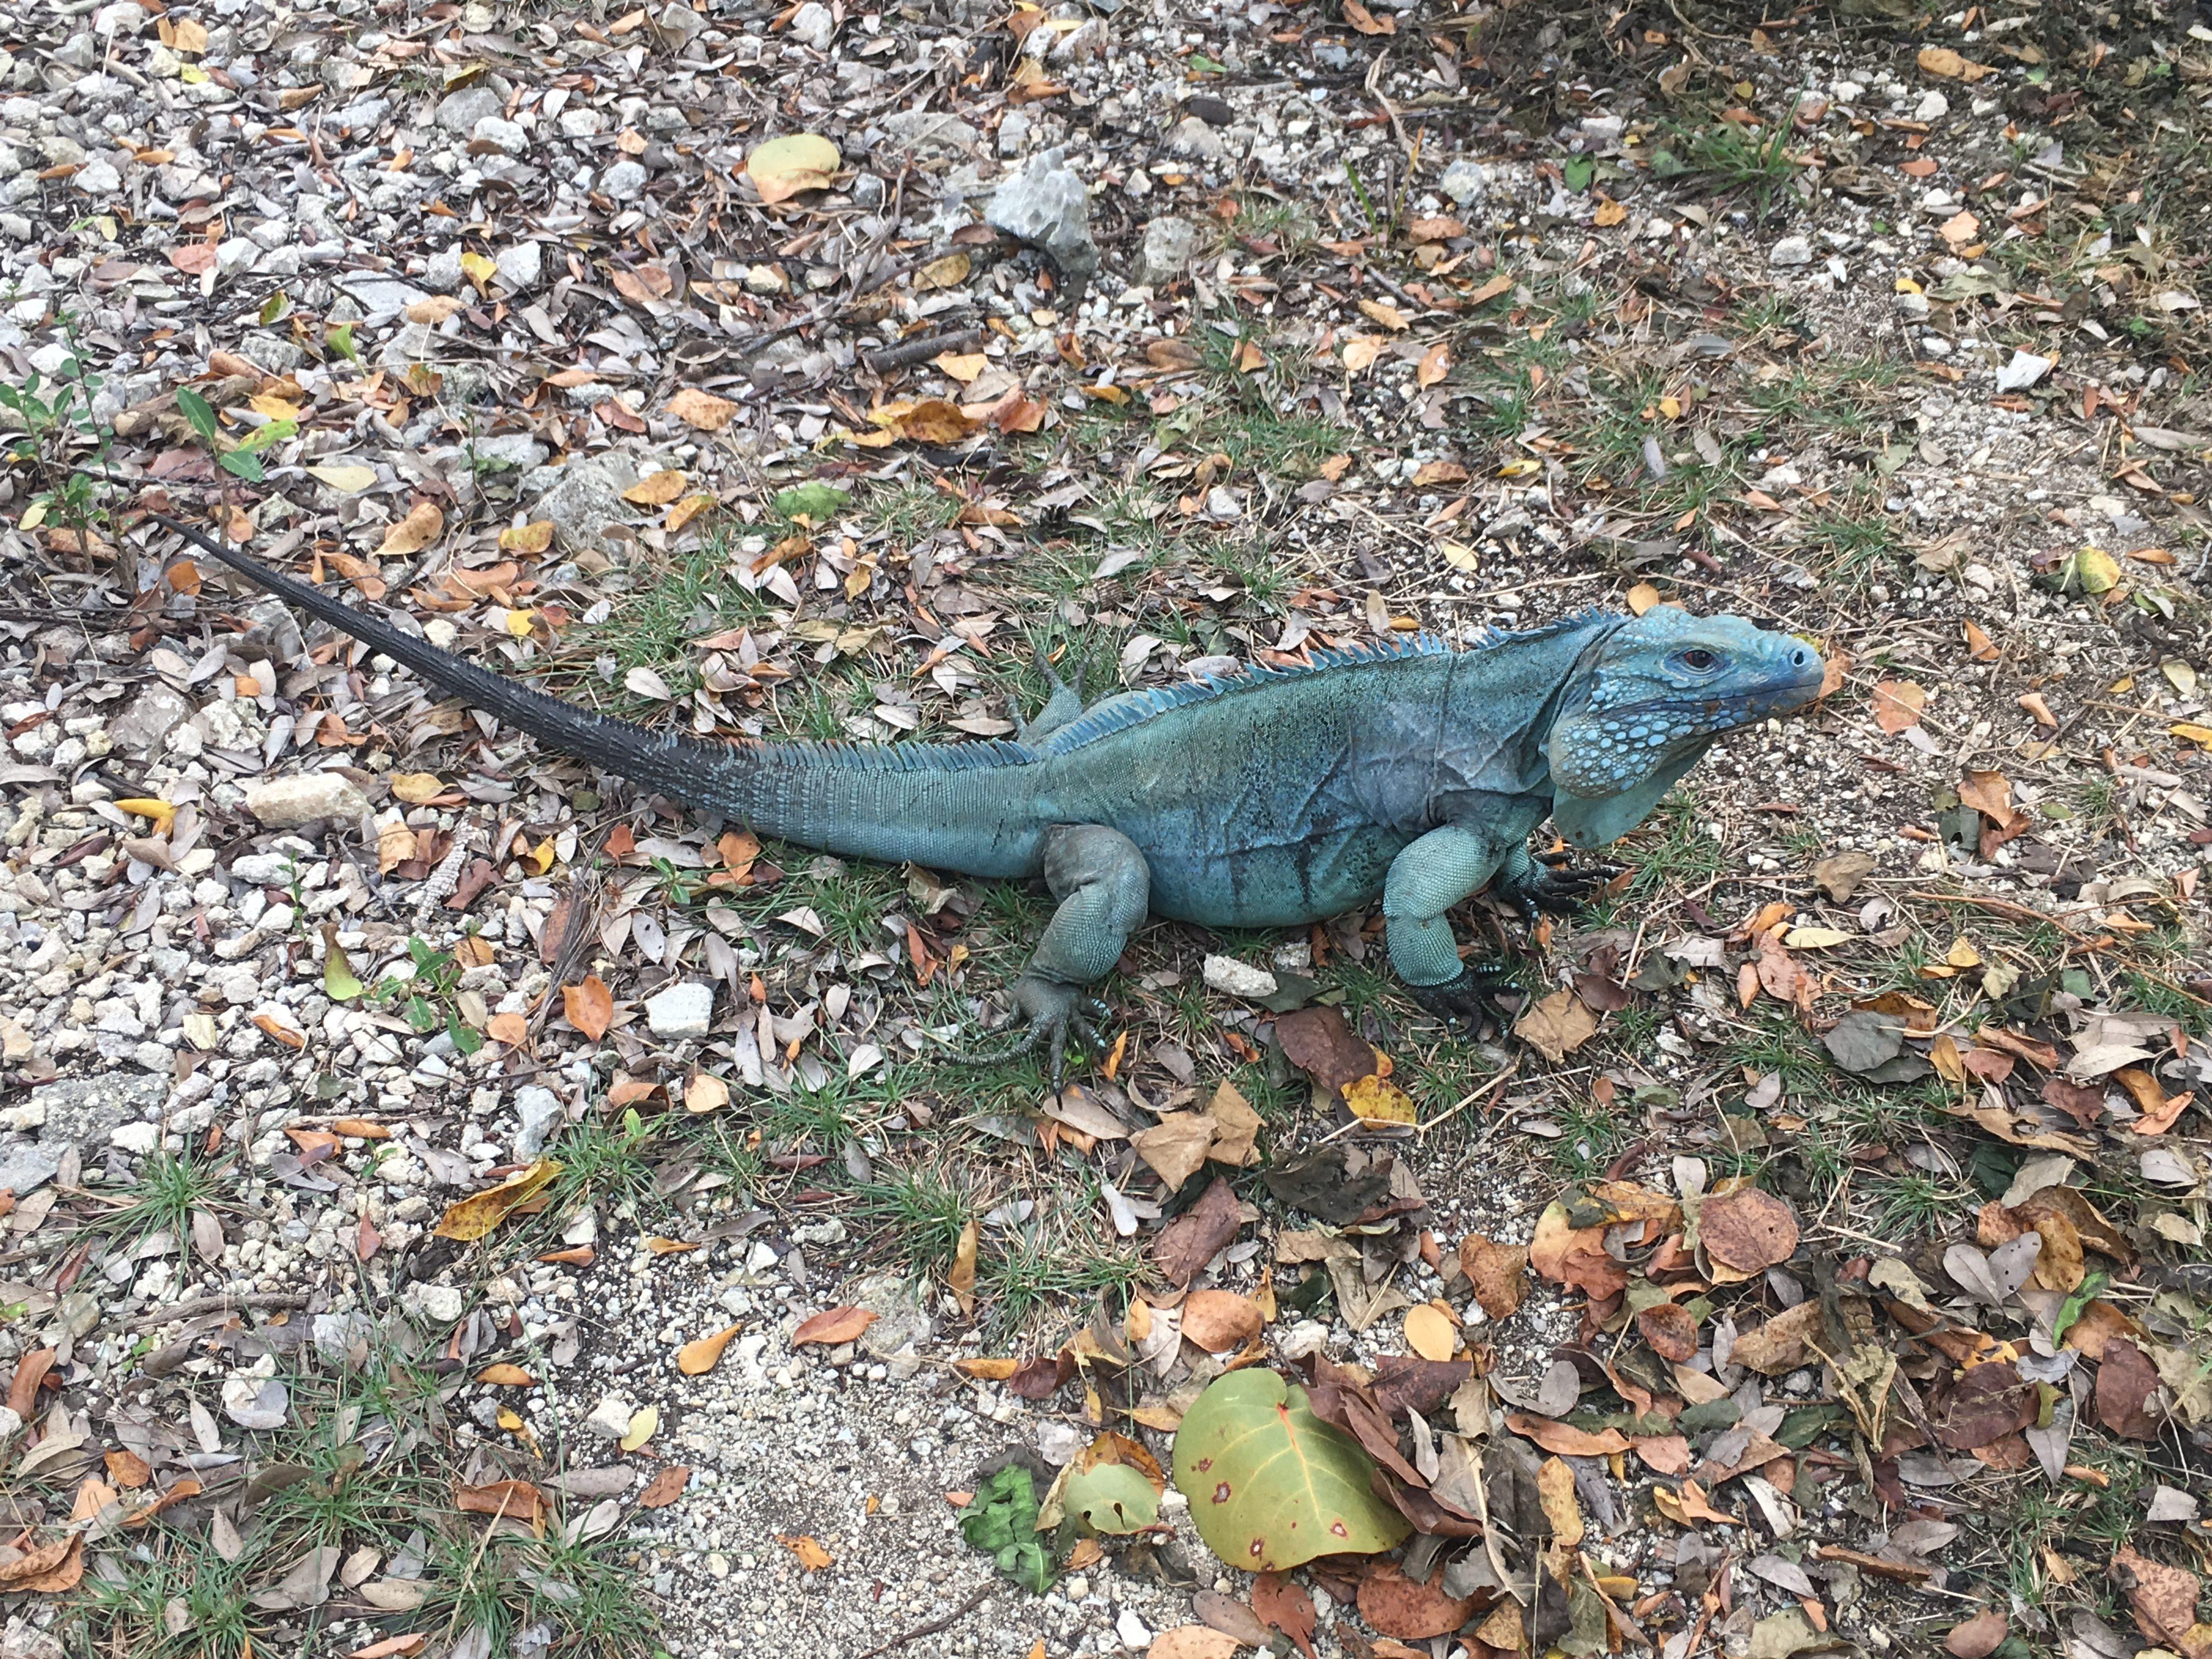 Grand Cayman's native species Blue Iguana